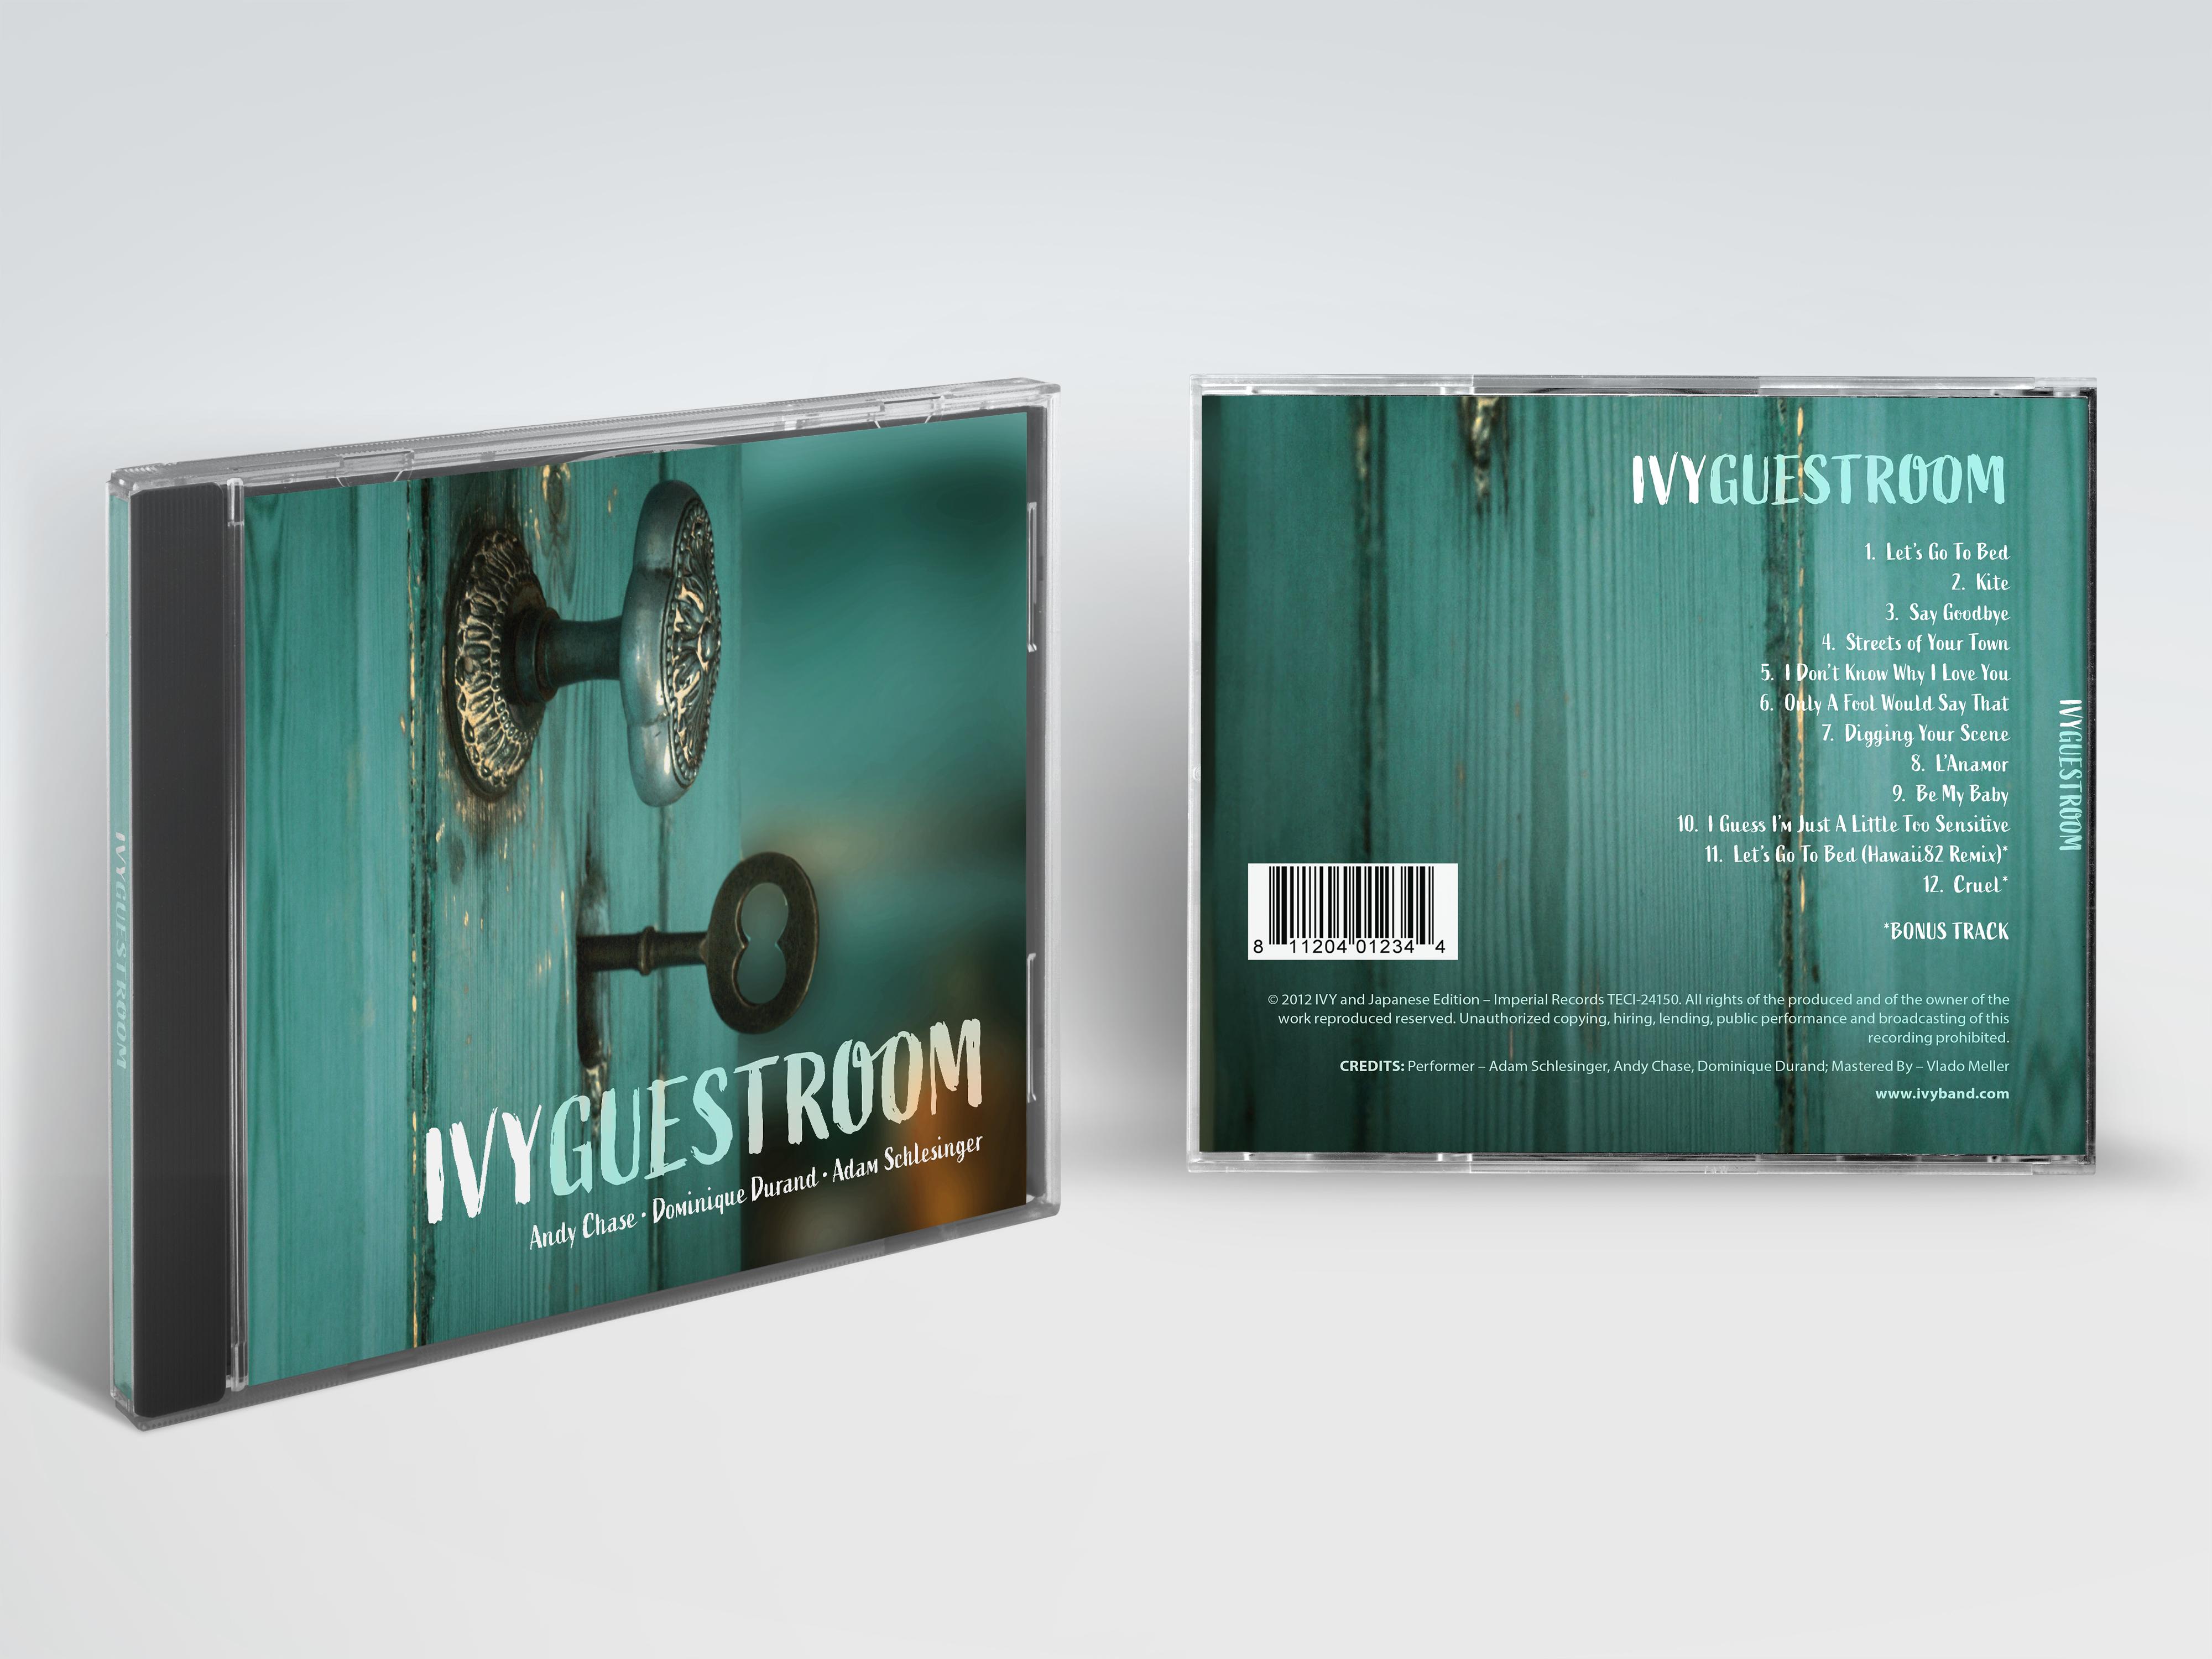 Ivy Album Cover Mockup